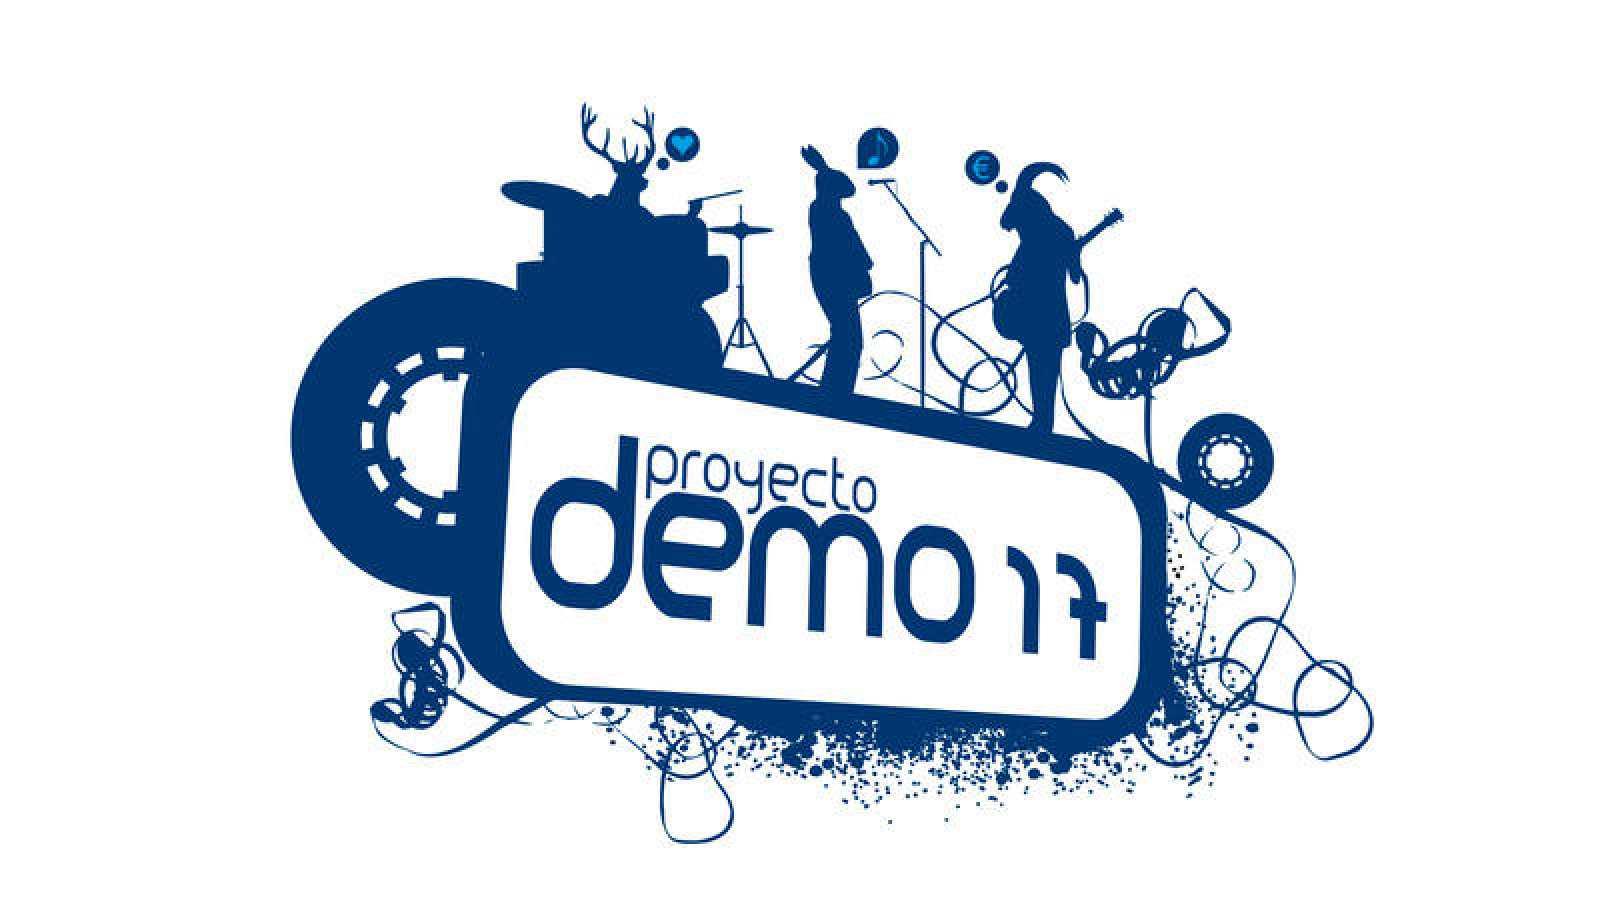 Proyecto Demo 2017